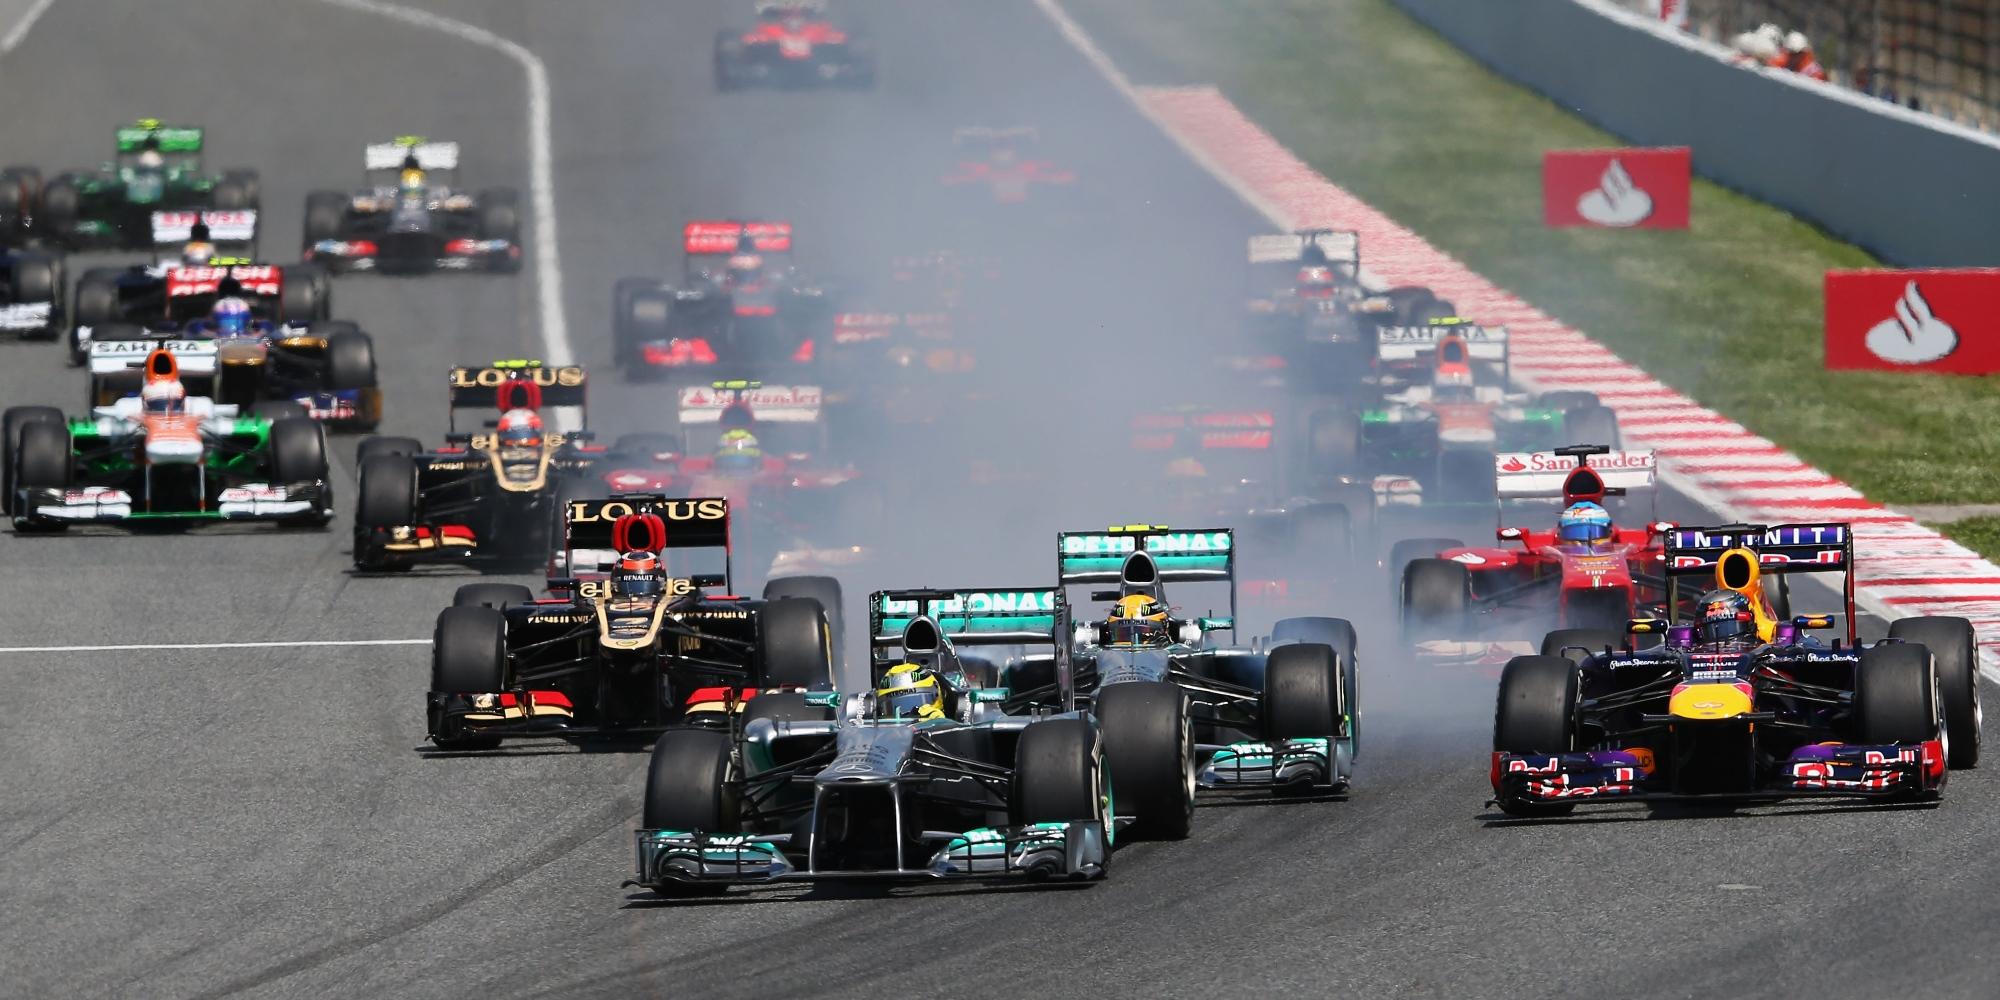 2013 Spanish Grand Prix start